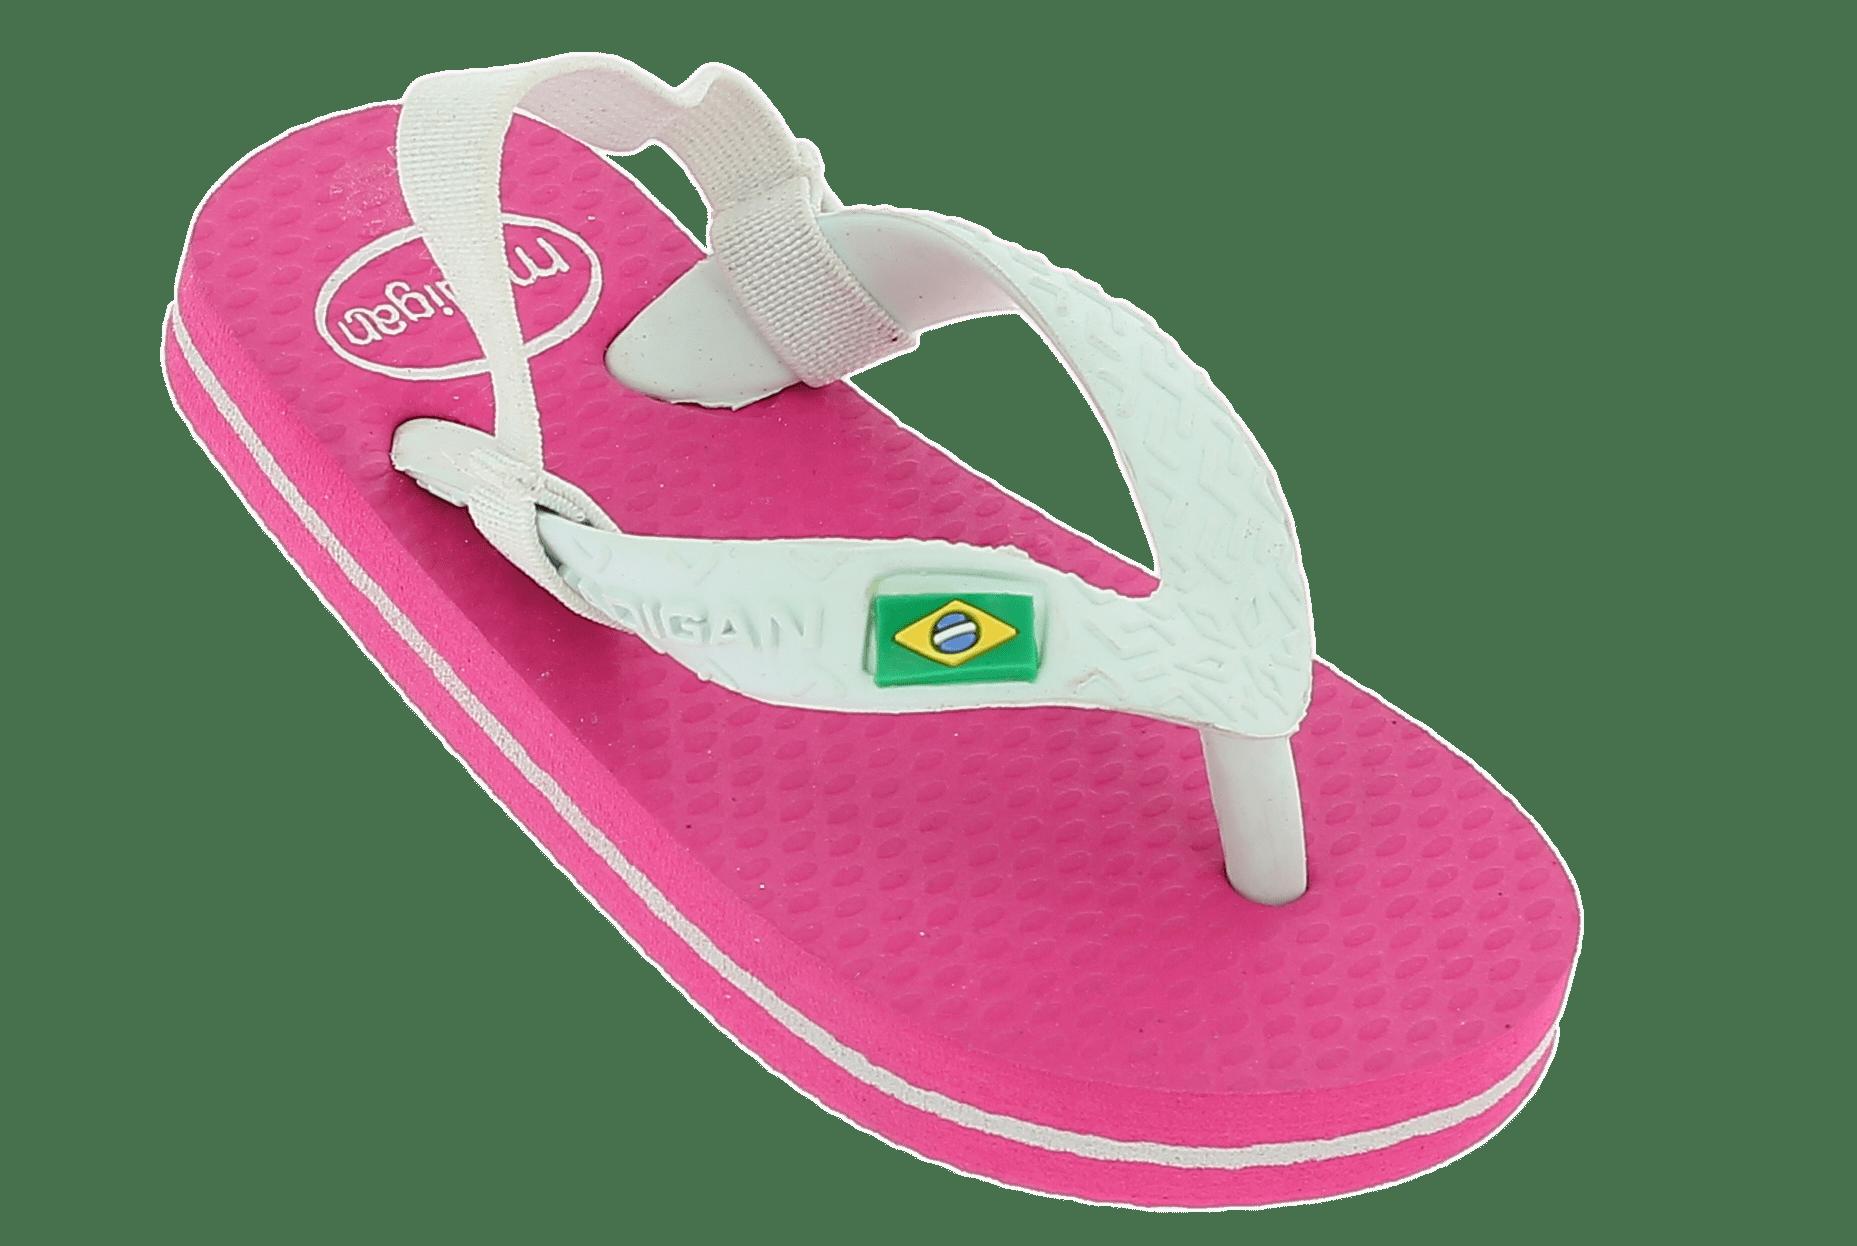 MADIGAN Κοριτσίστικη Σαγιονάρα RIOS ASS F 22-27 Φούξια